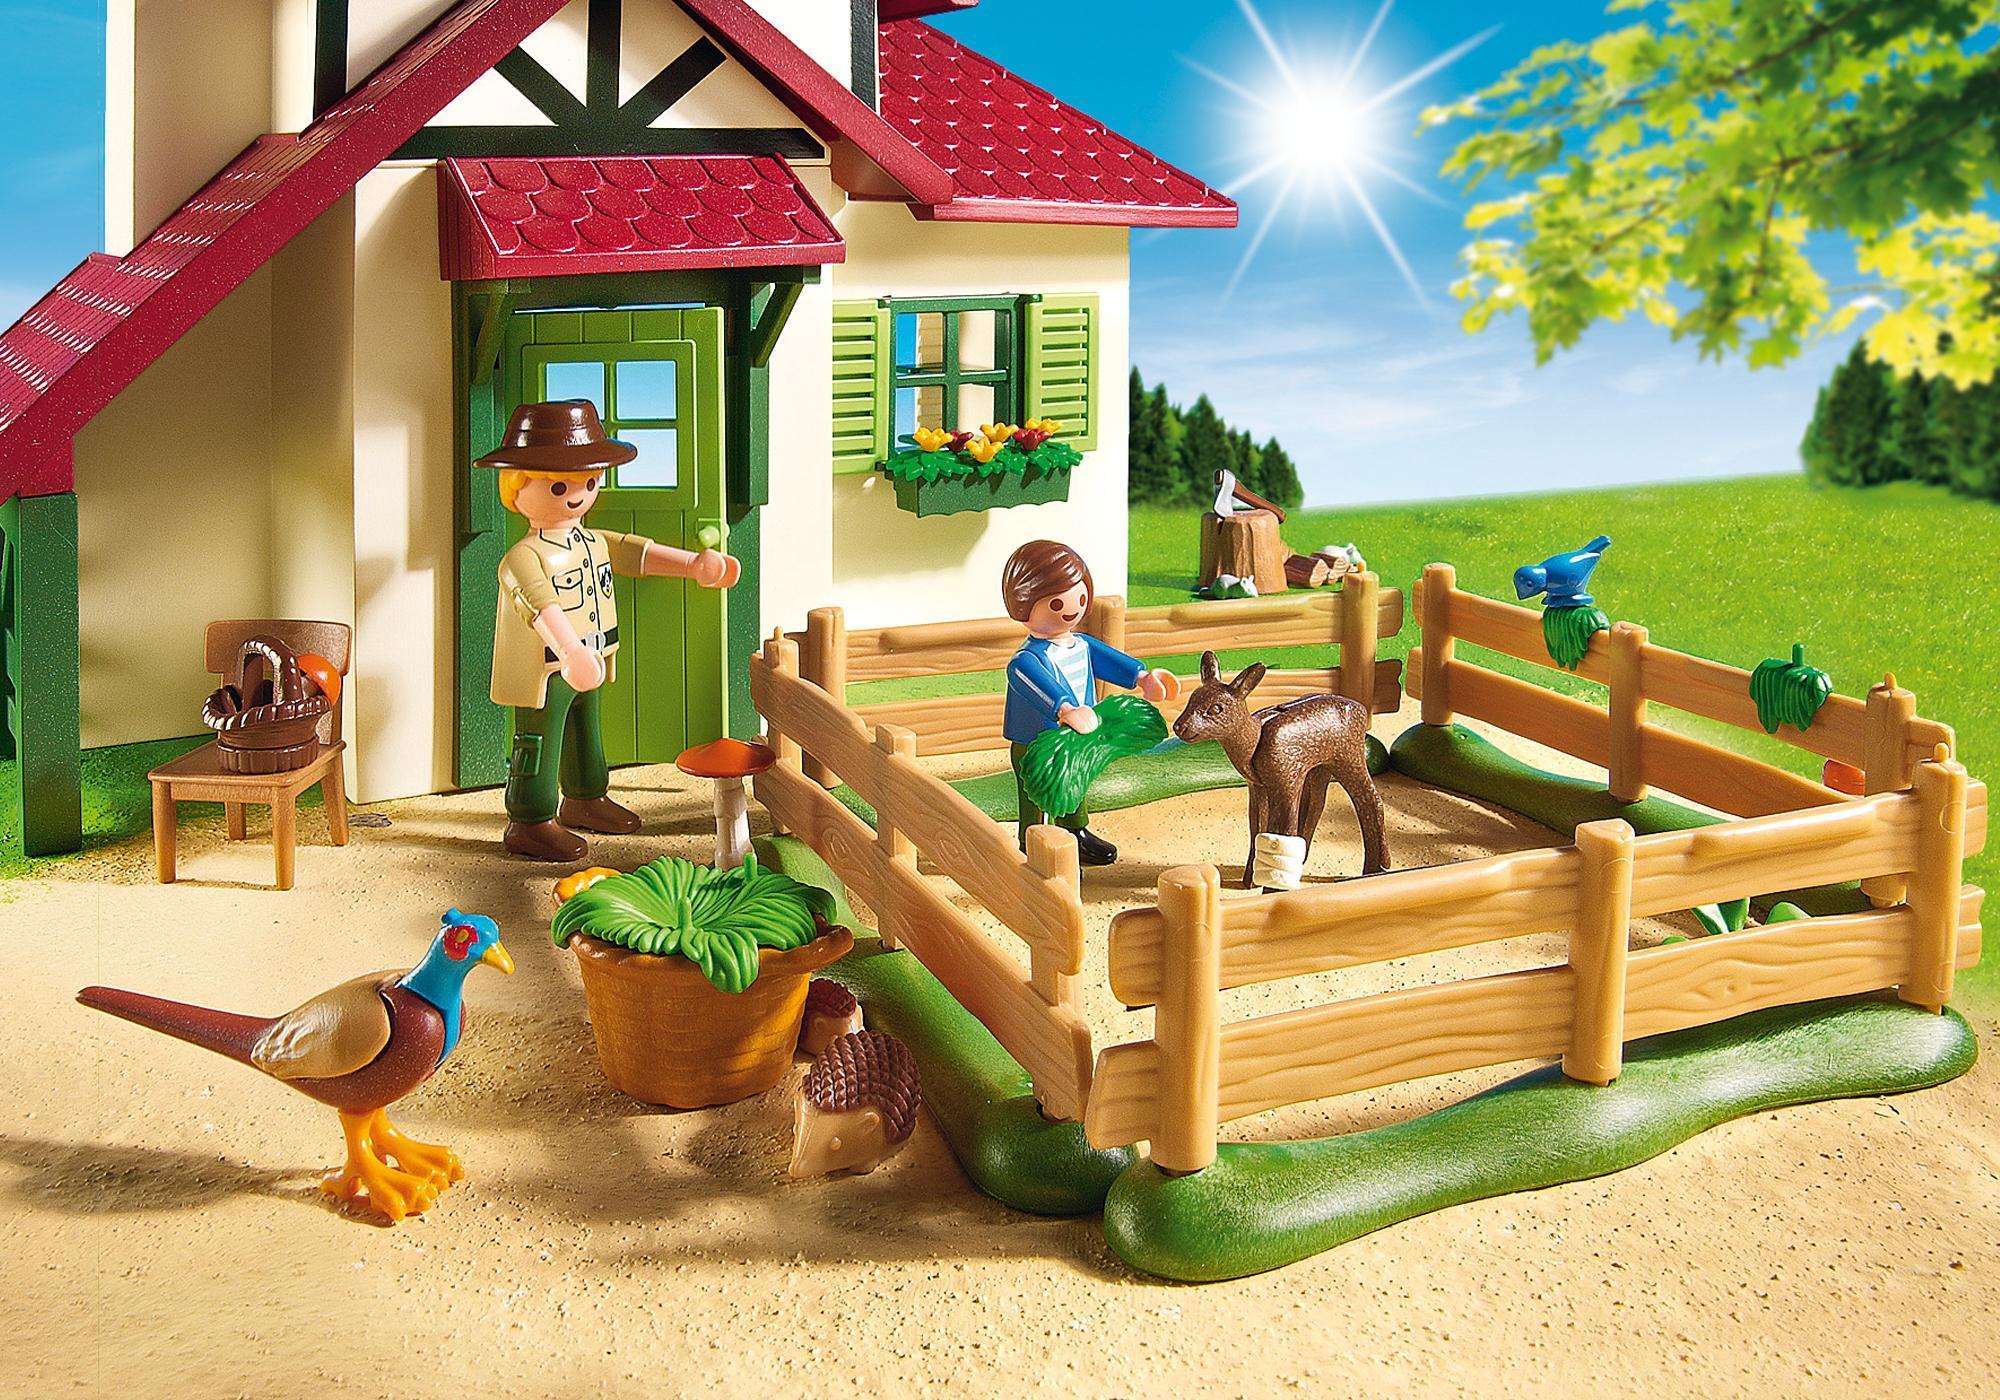 http://media.playmobil.com/i/playmobil/6811_product_extra2/Forest Ranger's House